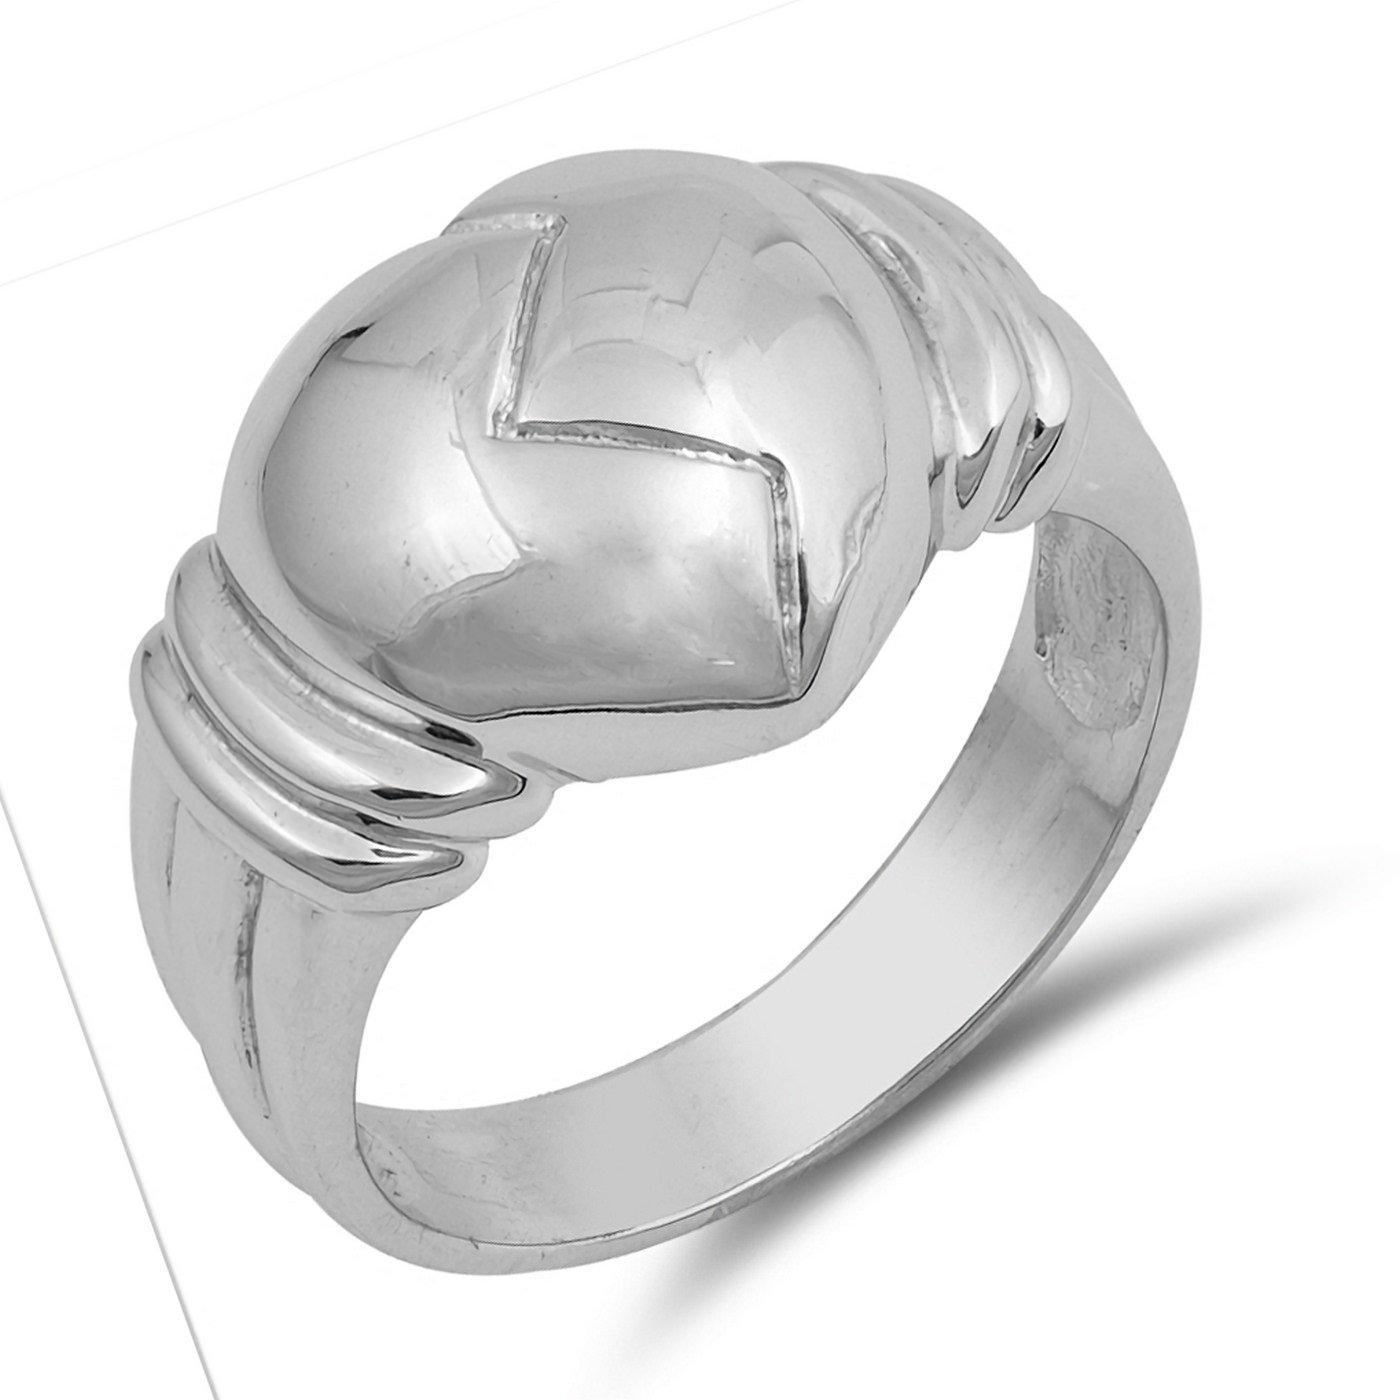 13mm Broken Heart Womens Ring 925 Sterling Silver Sizes 5-9